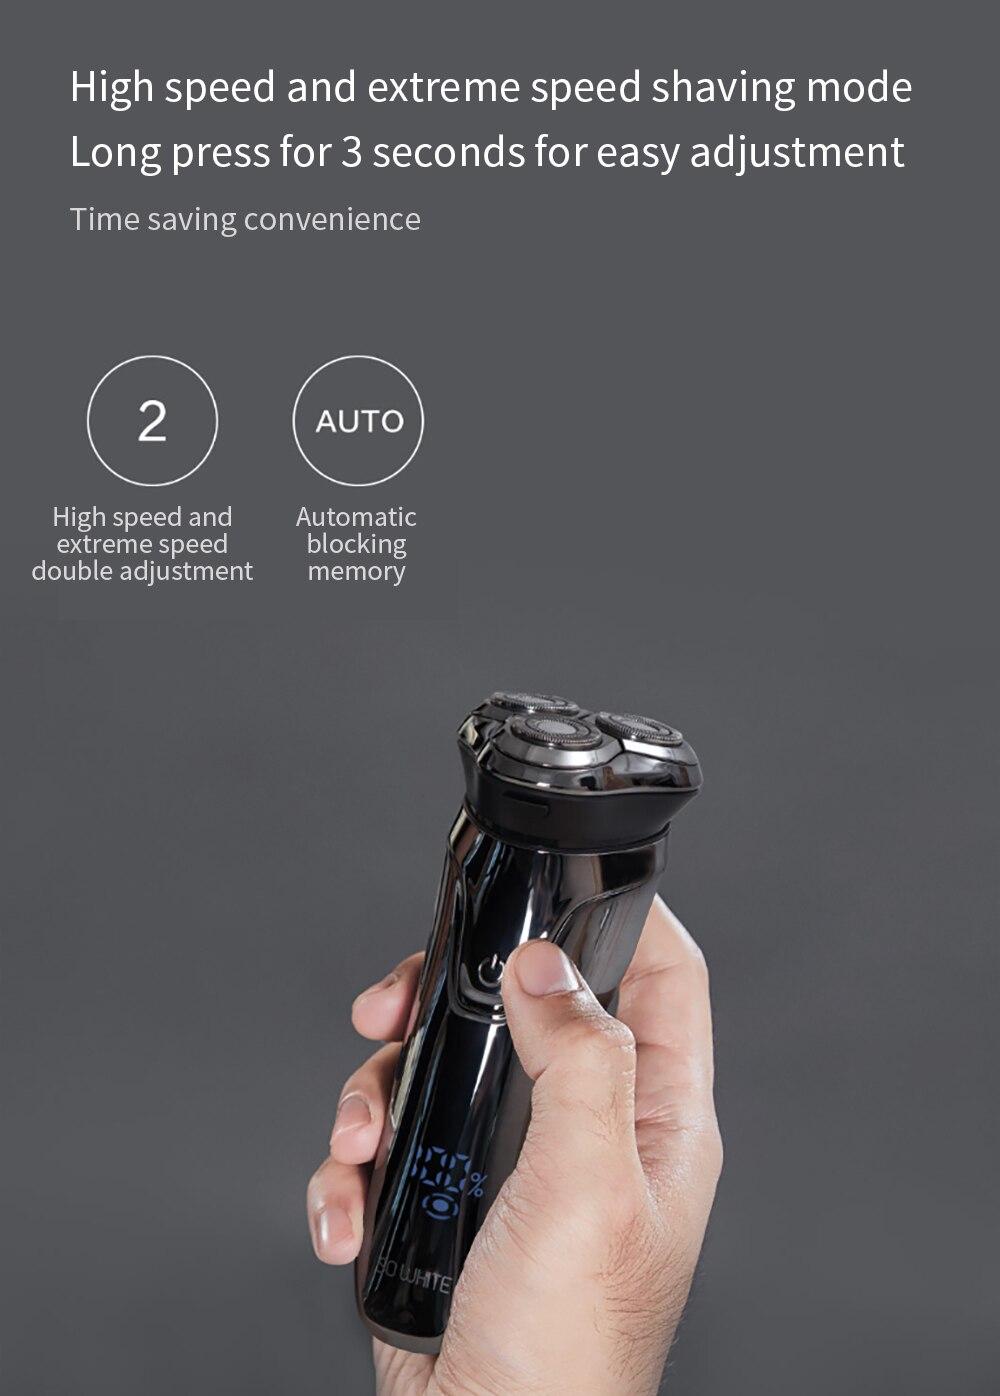 SOOCAS SO WHITE ES3 USB Rechargeable Electric Shaver xiaomi razor 3 head Electric Razor for men beard trimmer shaving machine 6